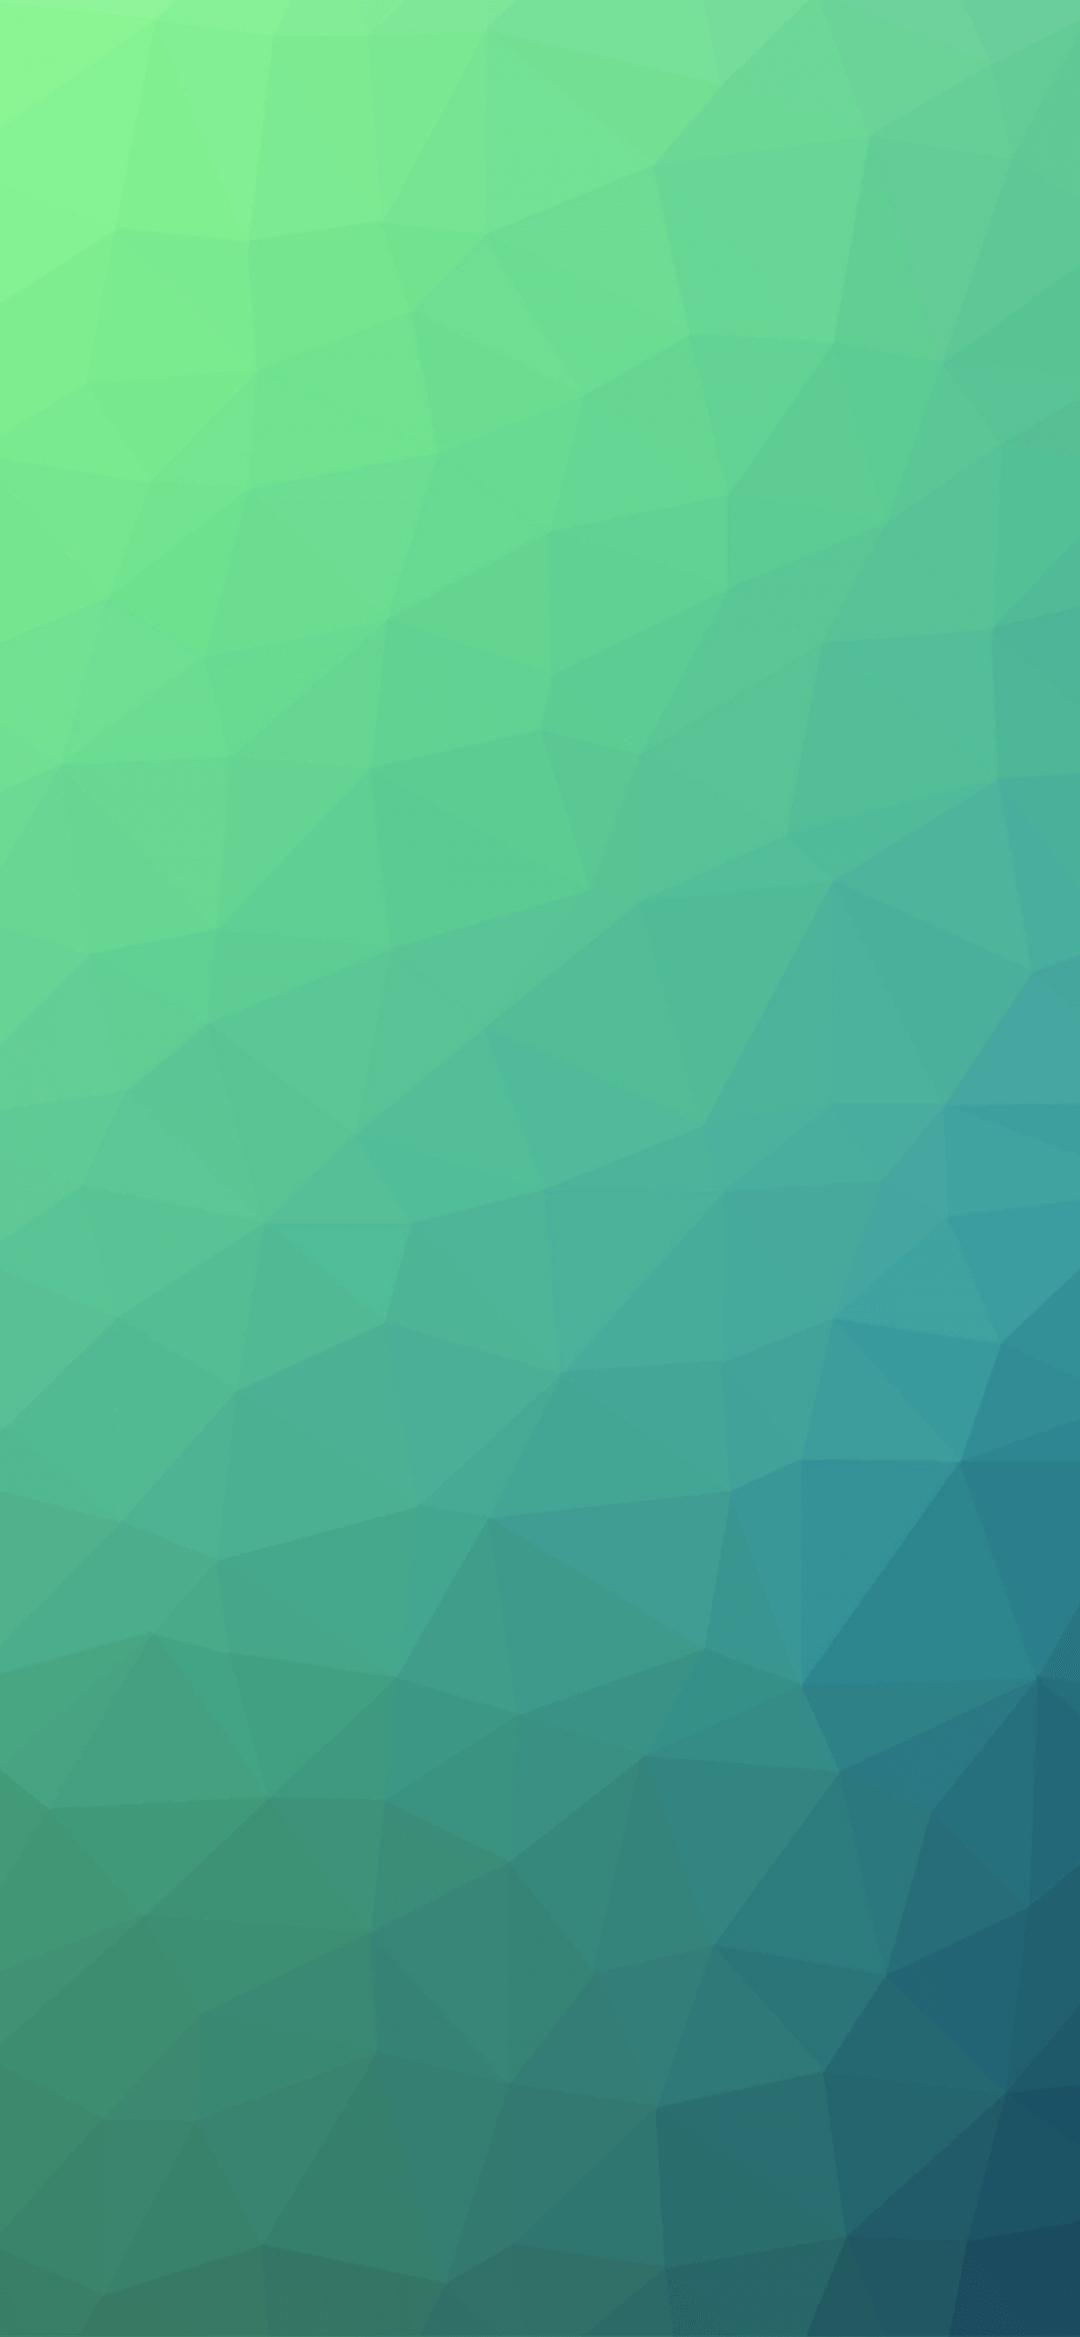 1080x2337 Aesthetic iPhone Mint Green Wallpaper HD